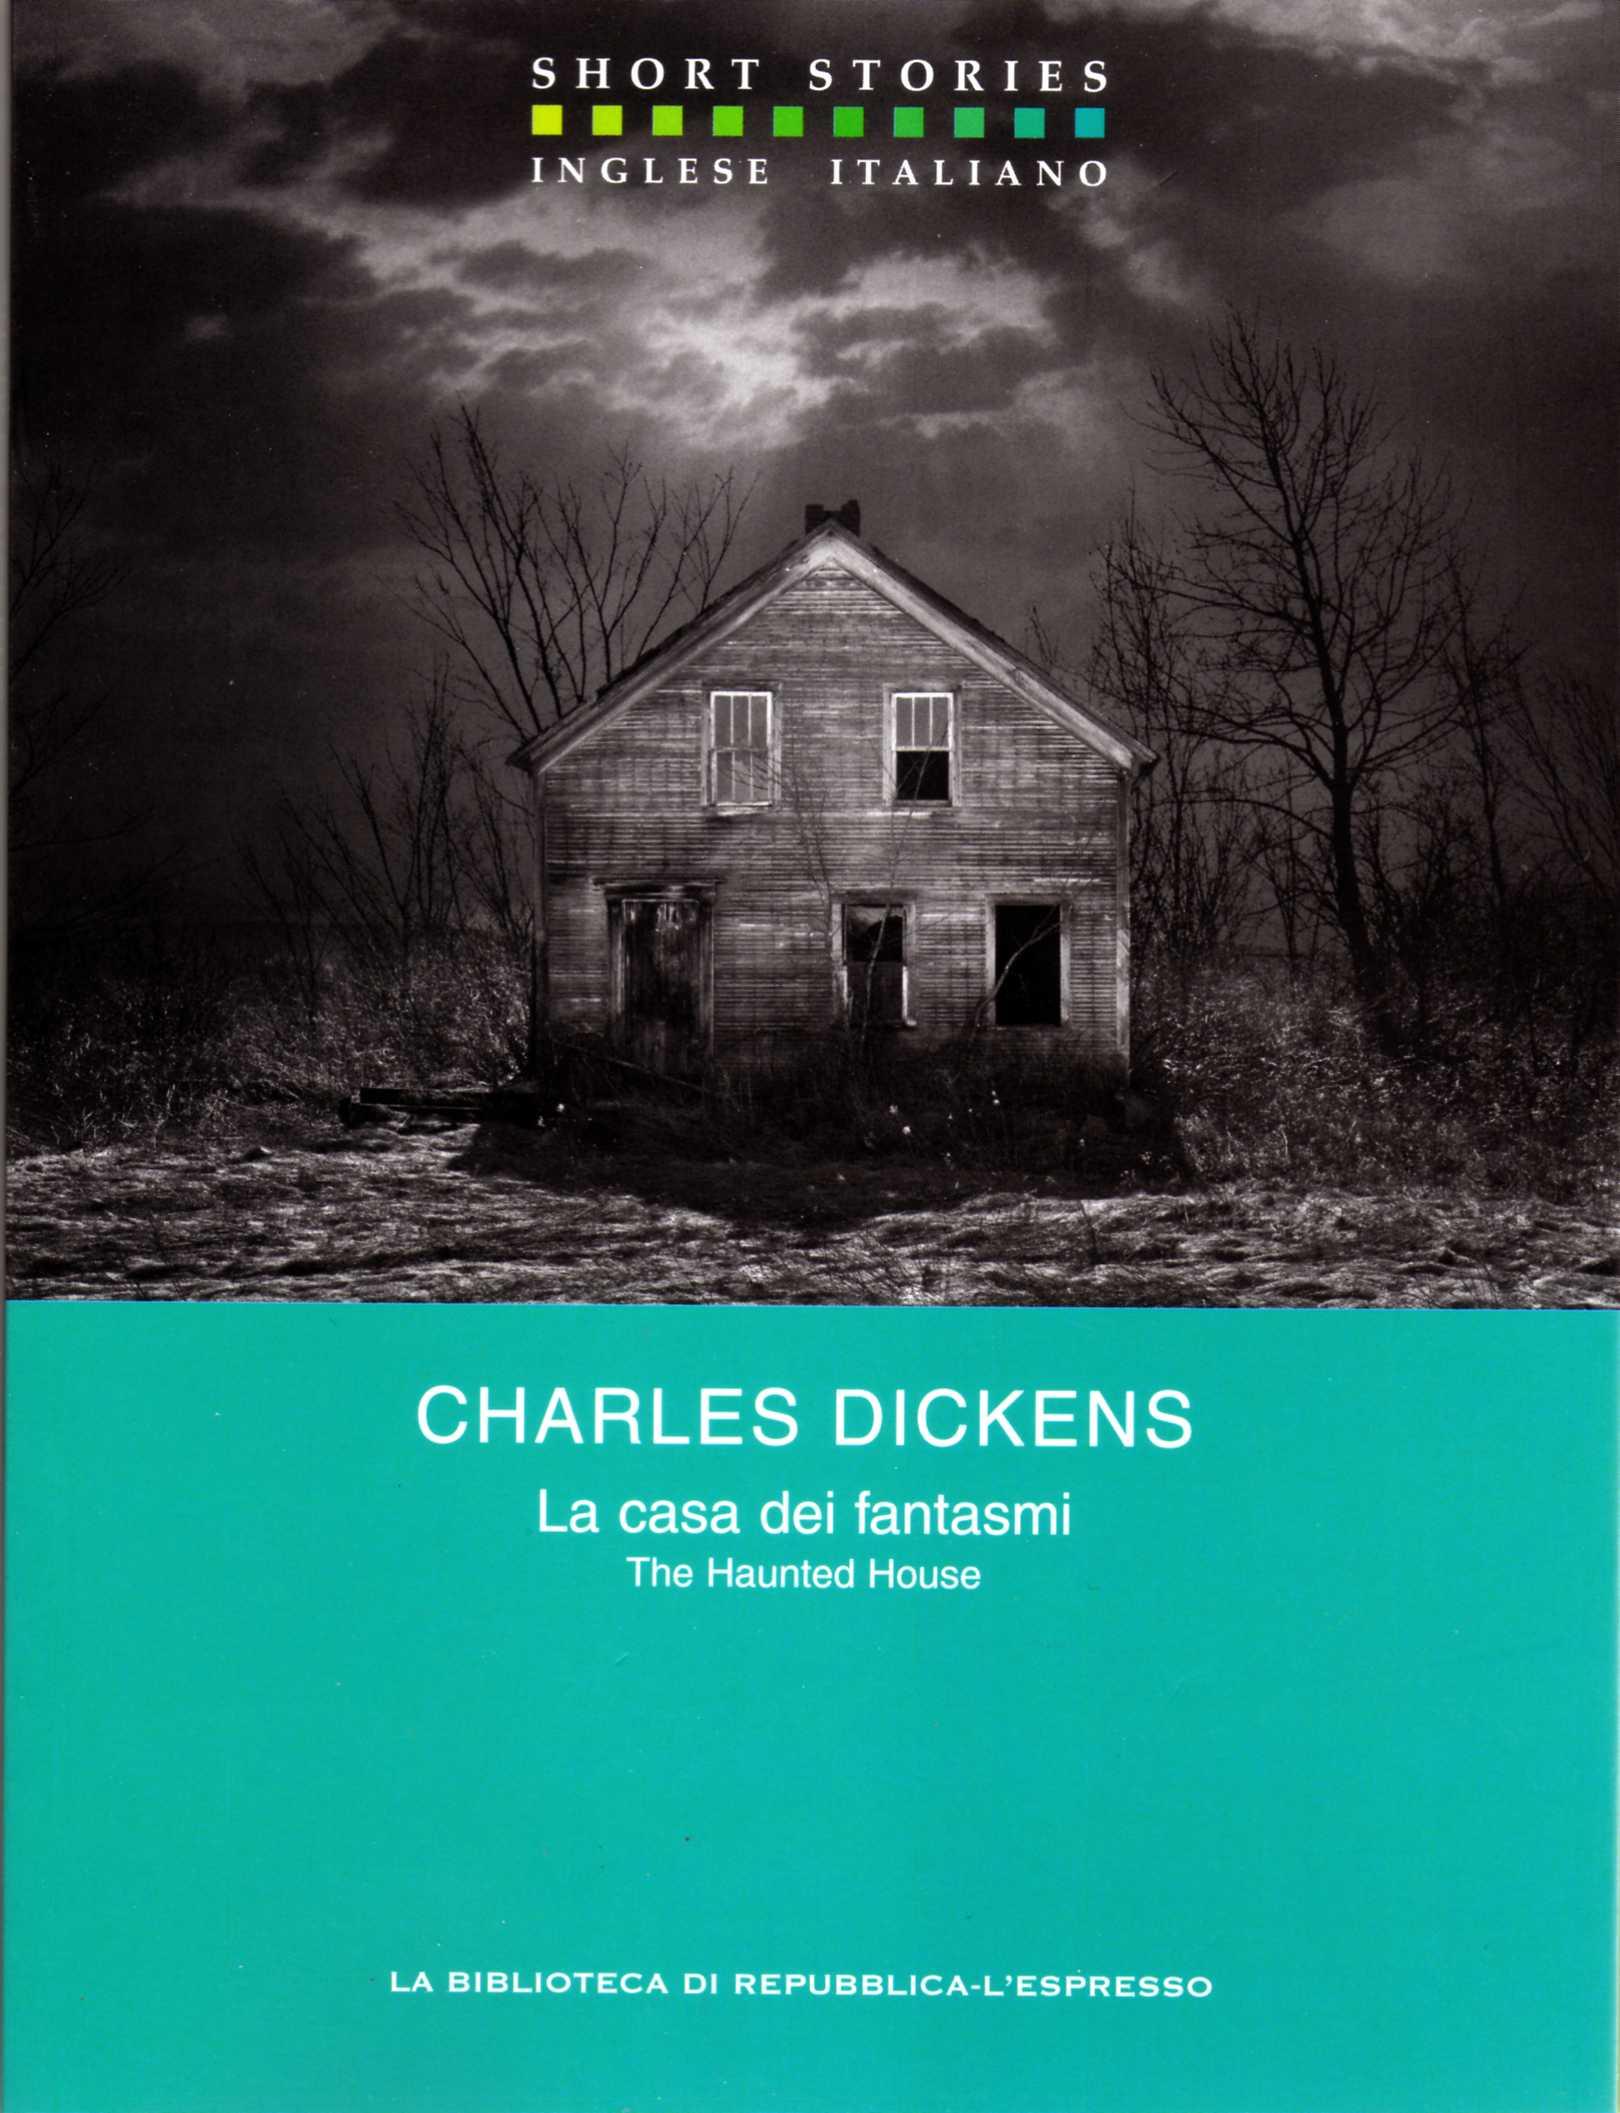 La casa dei fantasmi - The Haunted House